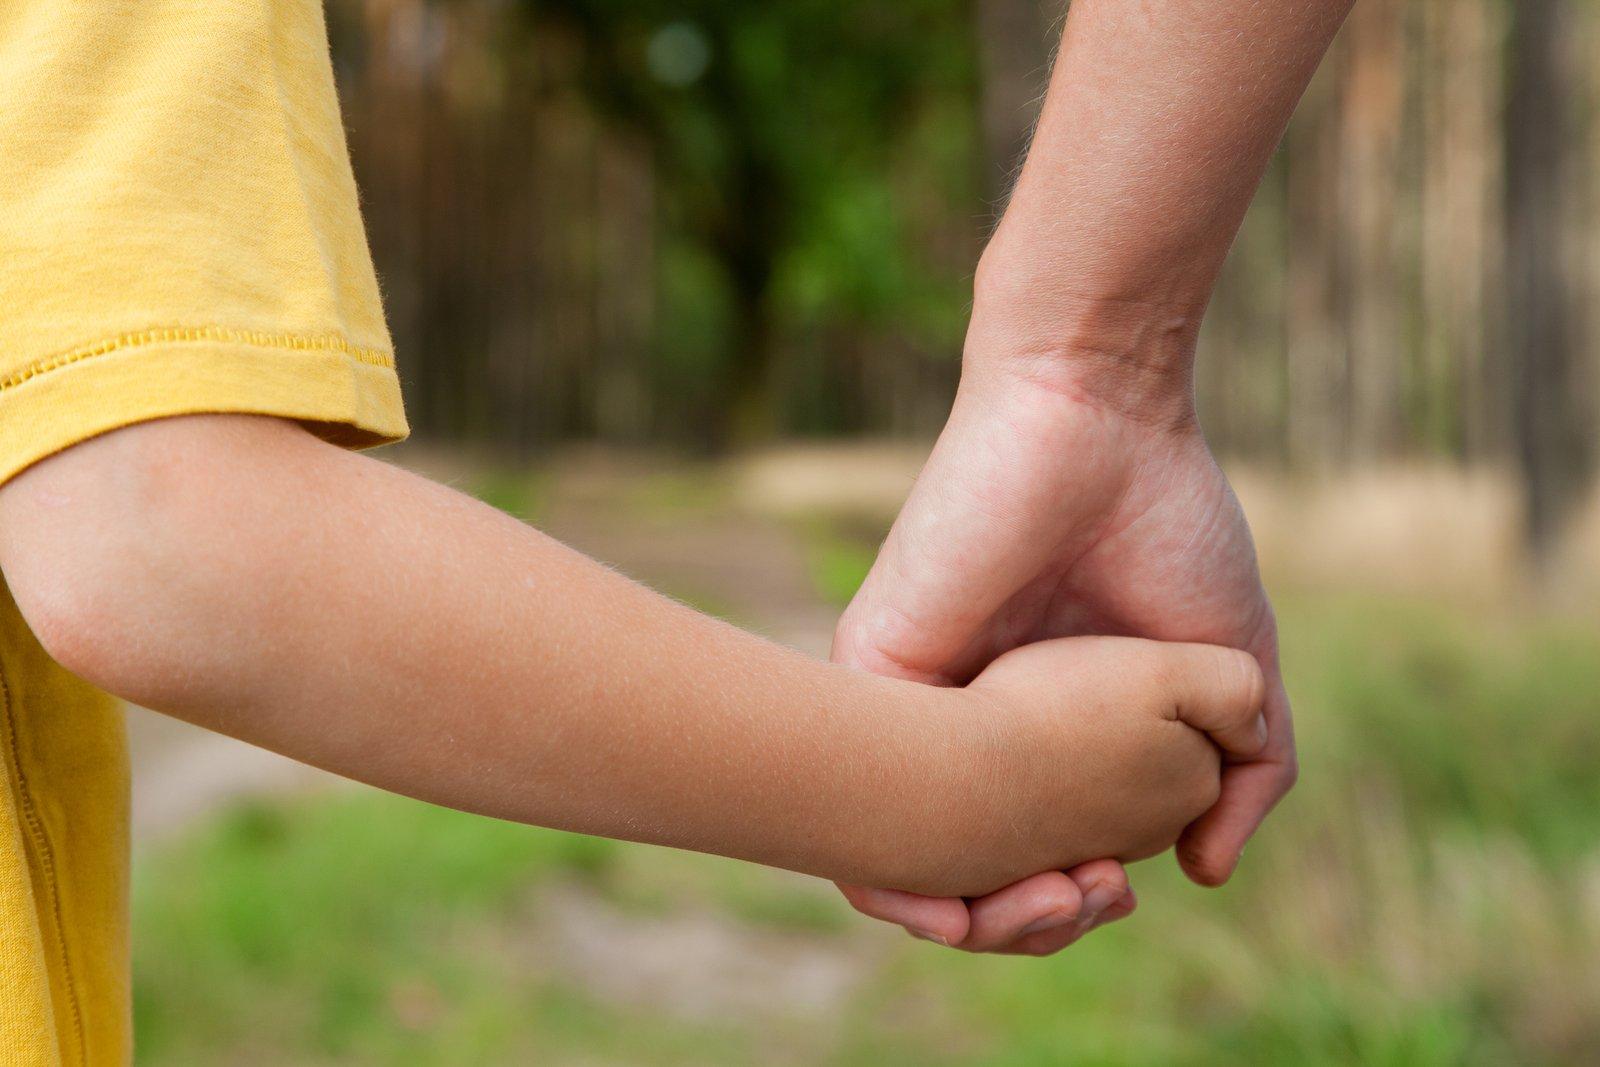 Practicar Mindfulness con mis hijos